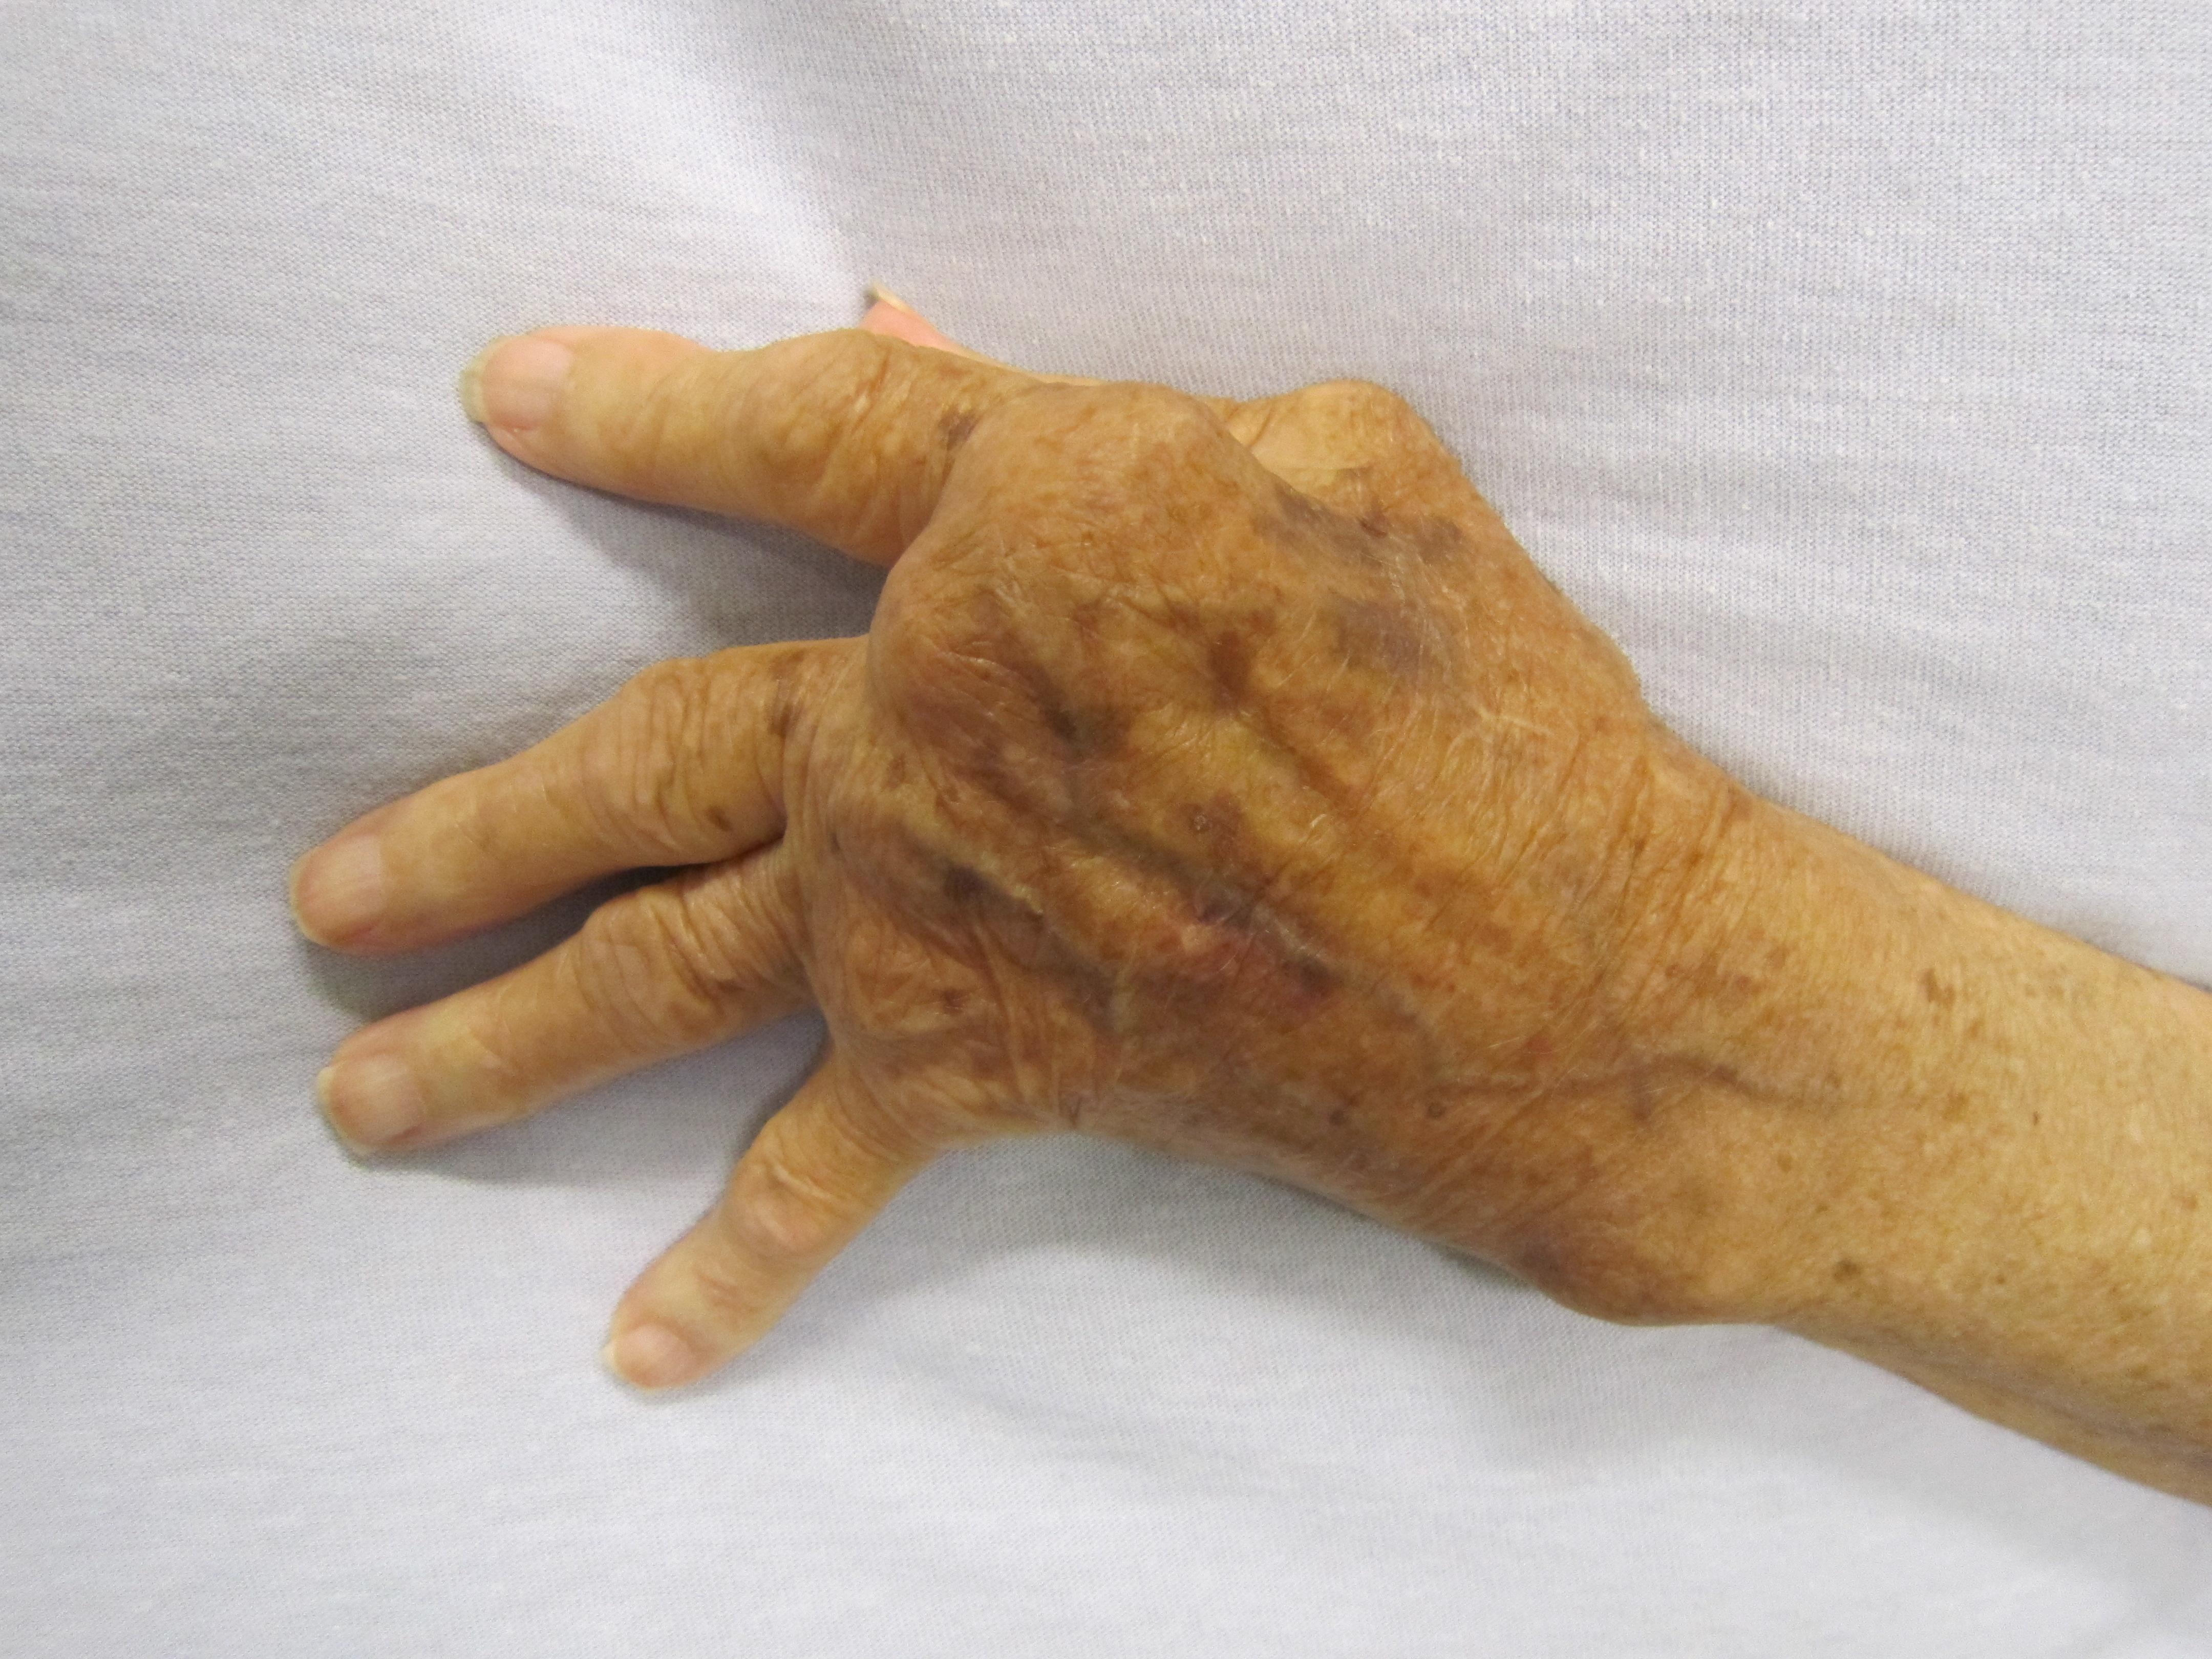 a kezek rheumatoid arthritis tünetei nőkben